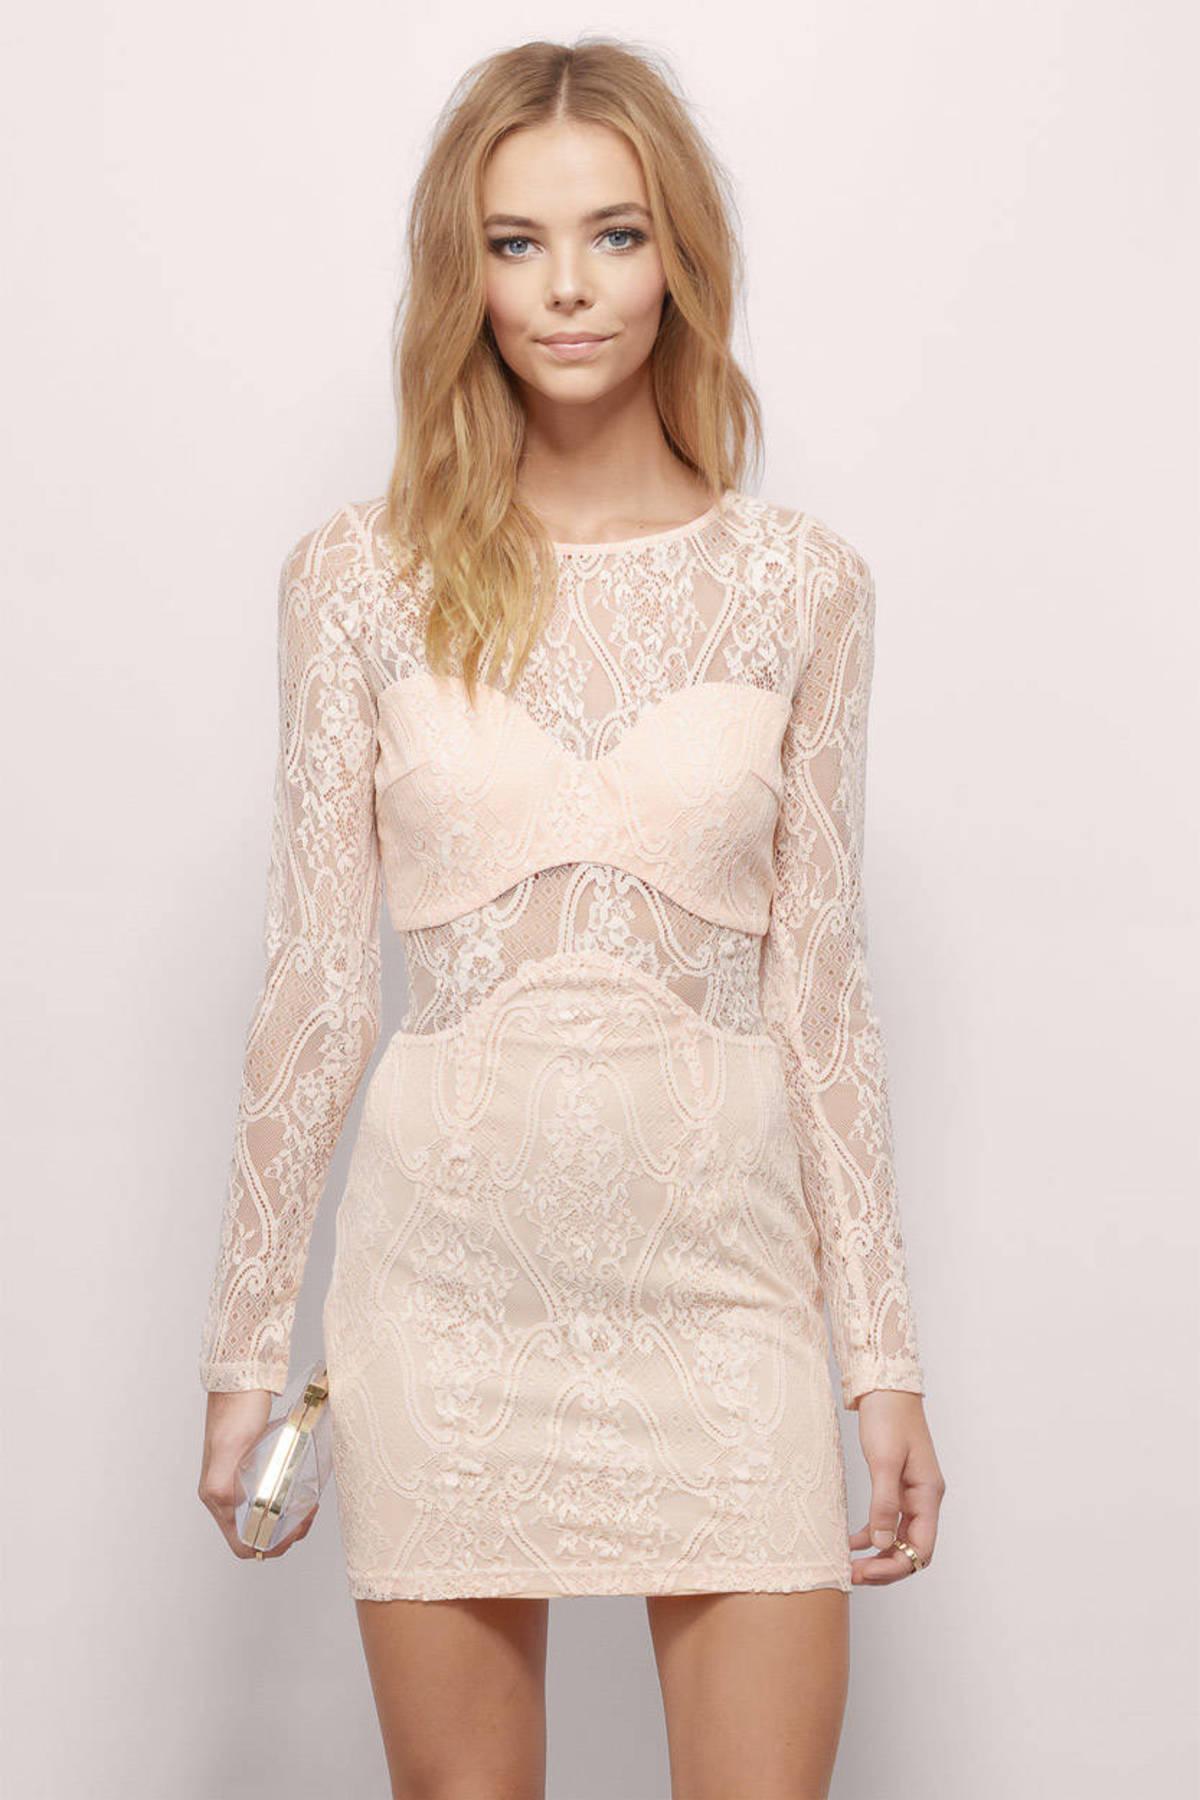 Peach Bridesmaid Dresses | Shop Peach Bridesmaid Dresses at Tobi ...